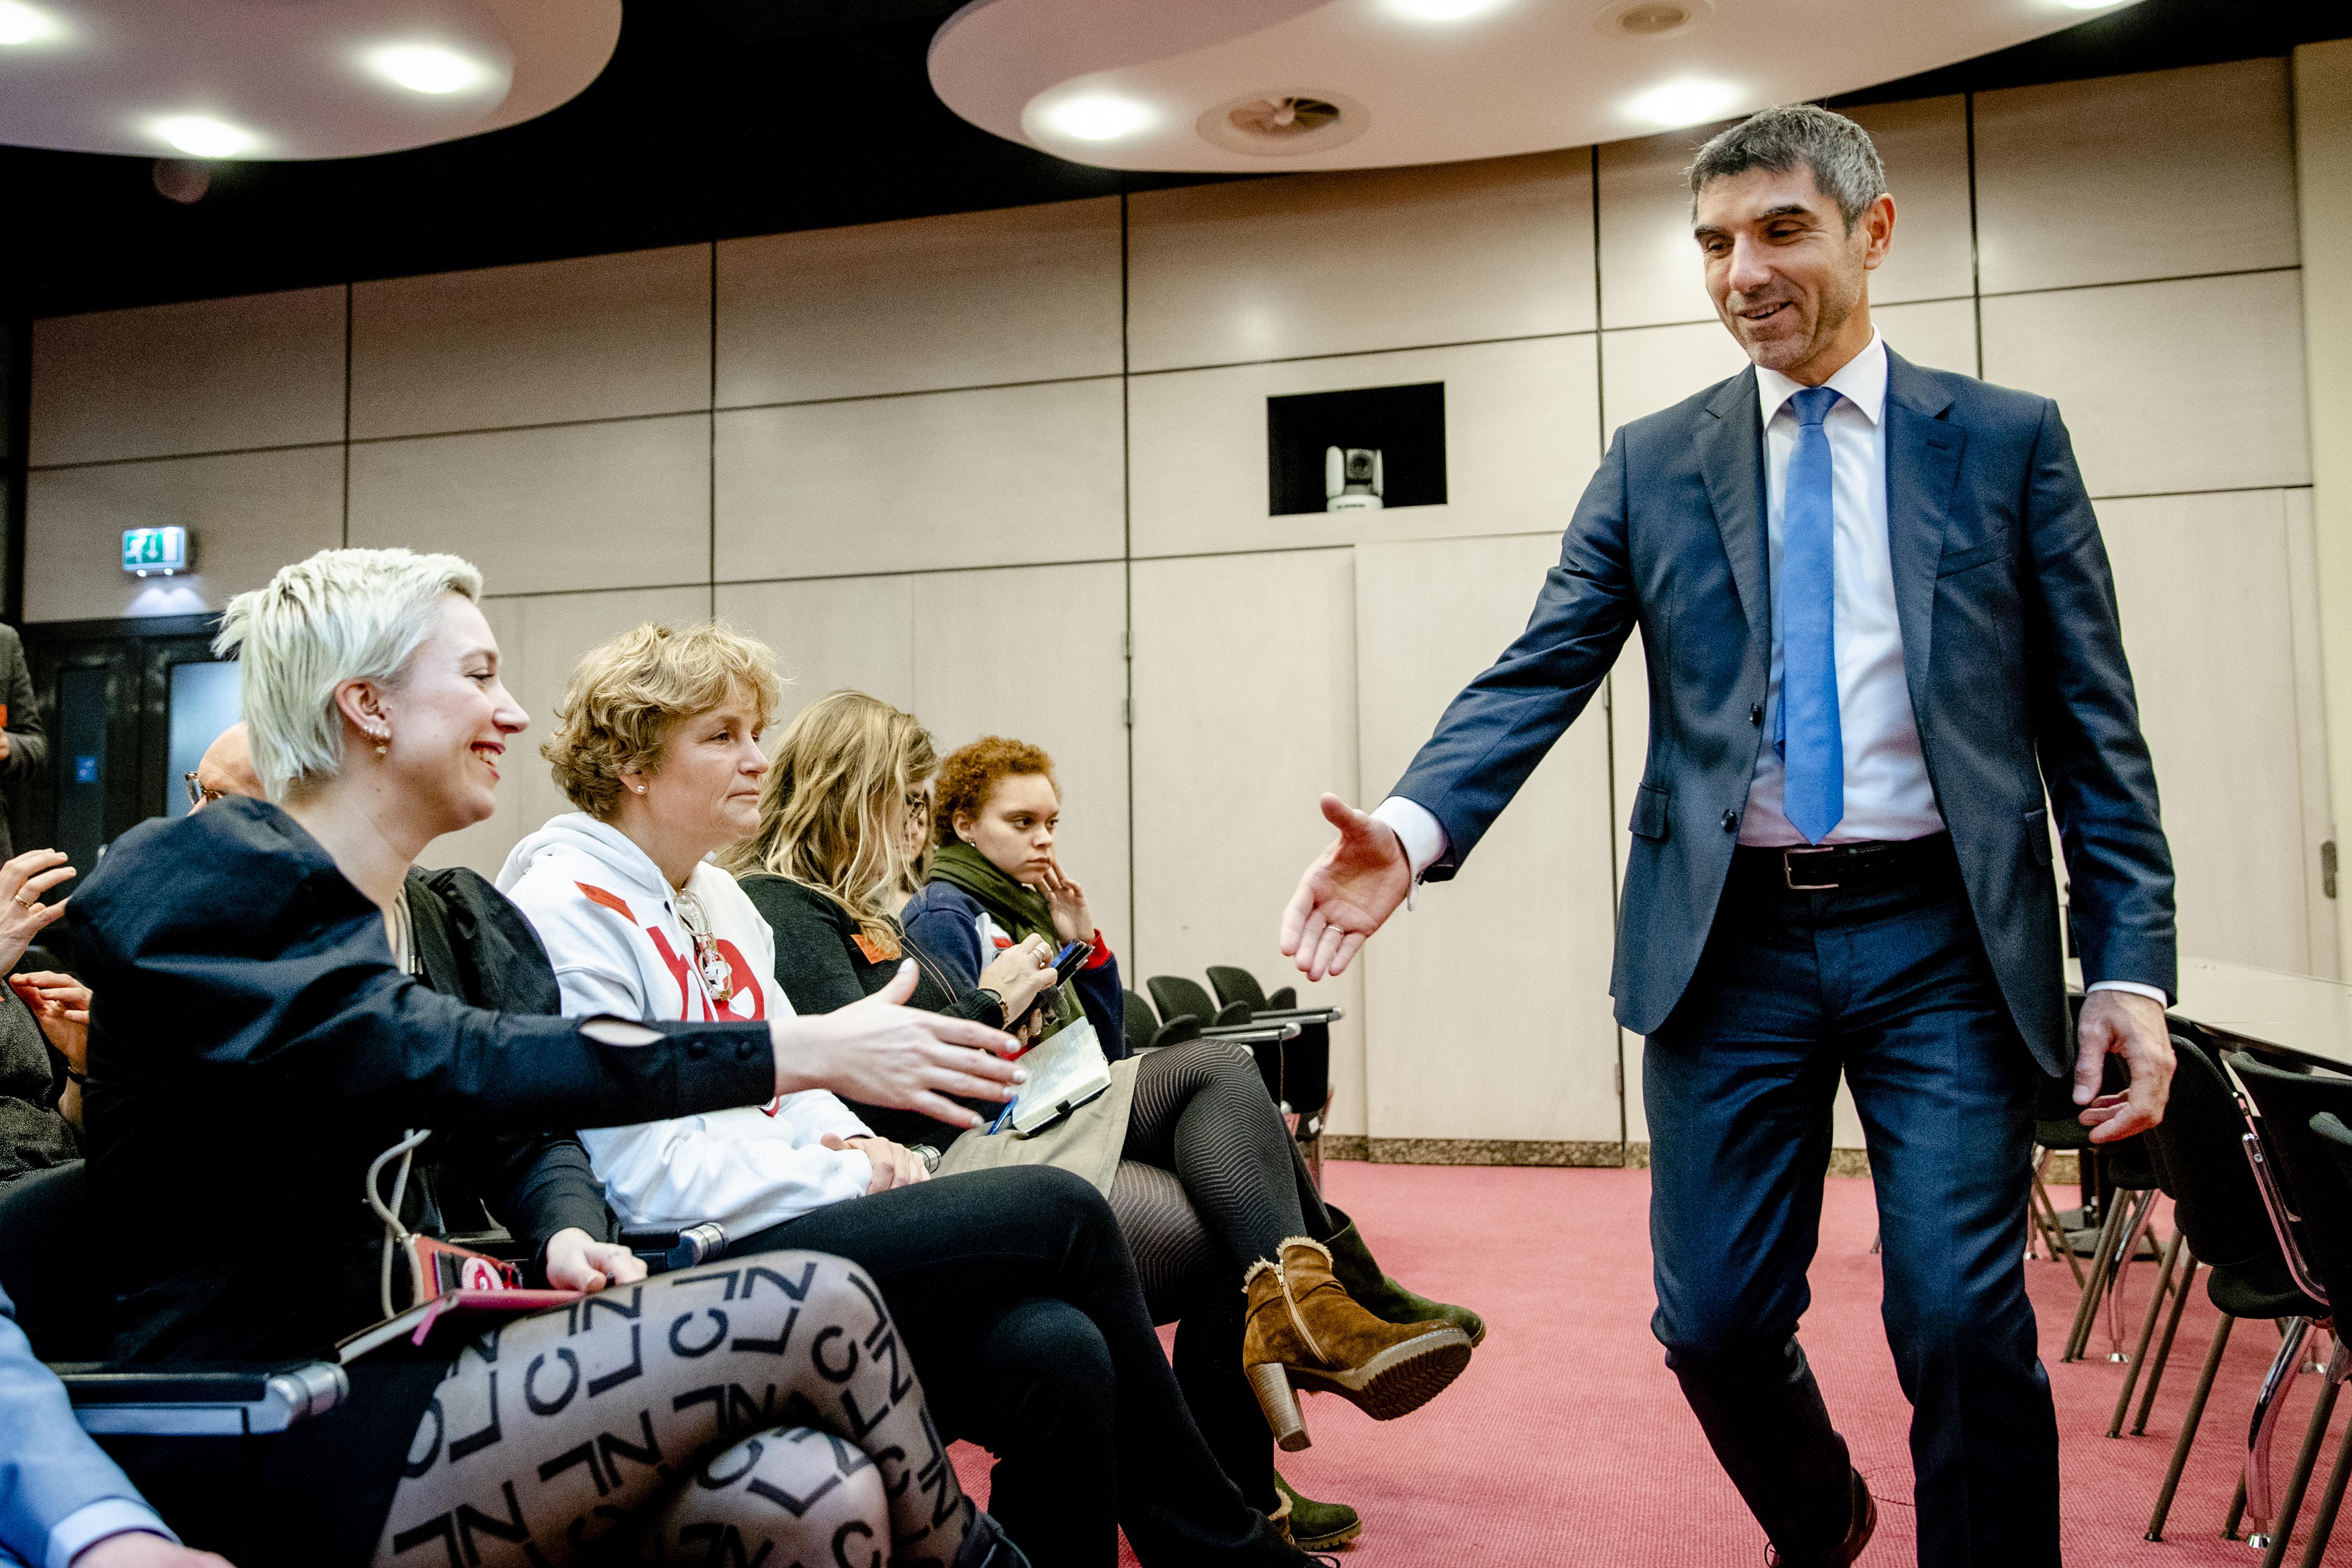 staatssecretaris Paul Blokhuis begroet Charlotte Blokhuis